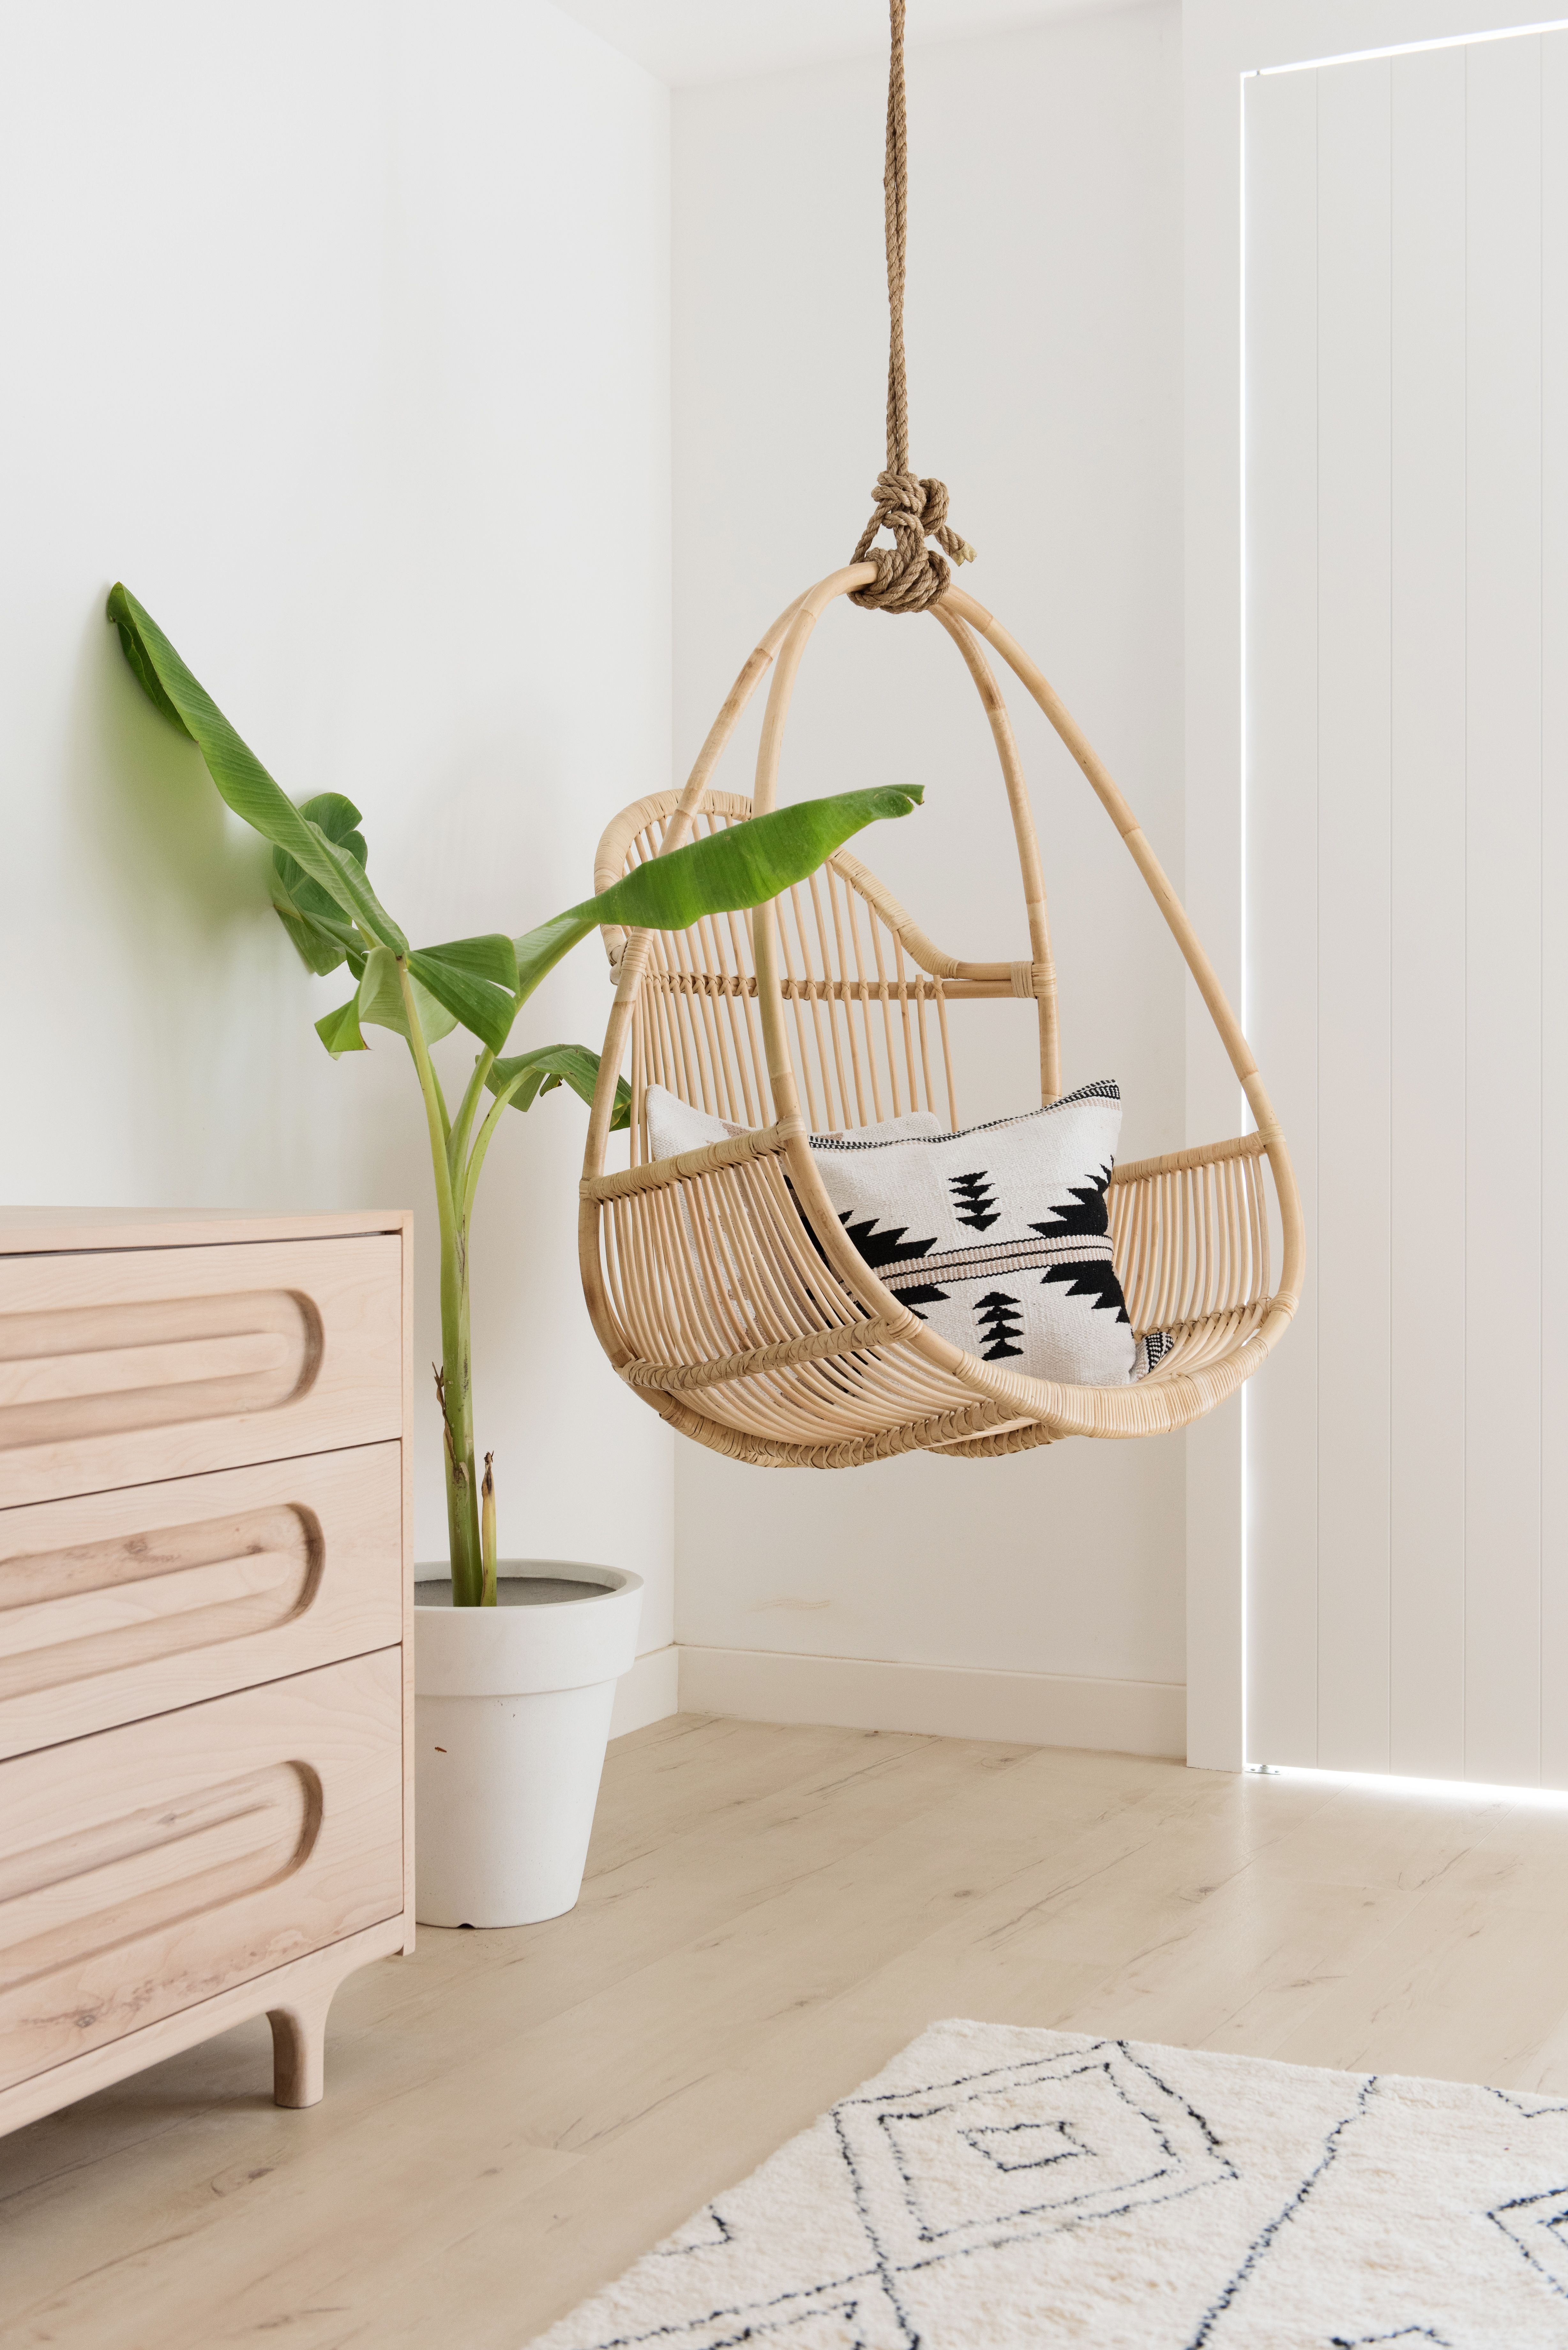 Swing Chair Hanging Chair Boho Chair Floating Chair Rattan Chair Boho Design Australian Home Style Light Floating Chair Hanging Chair Light Wood Dresser